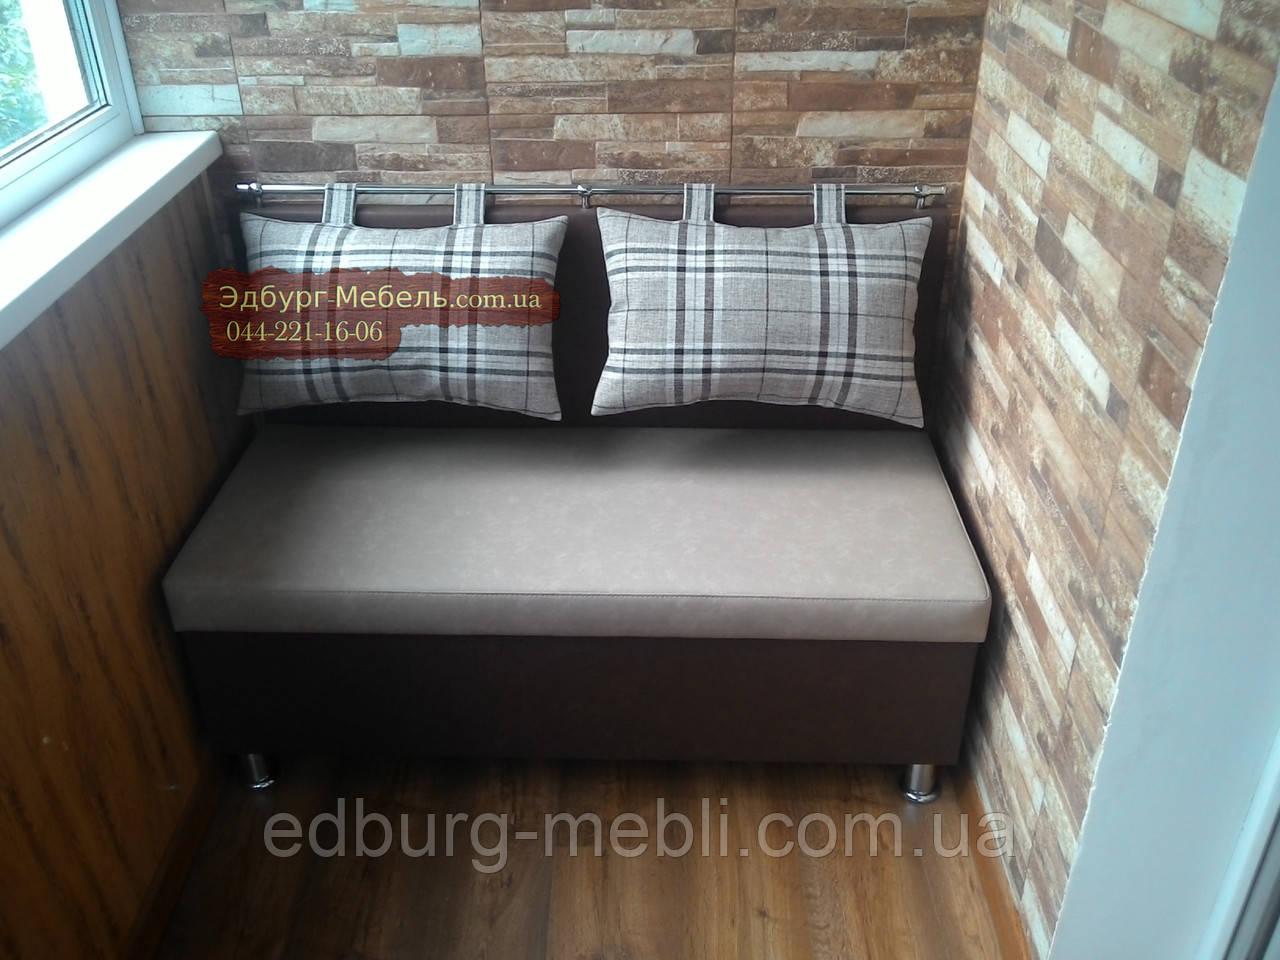 "Диван для кухни, лоджии, балкона ""комфорт"" экокожа + ткань 1."